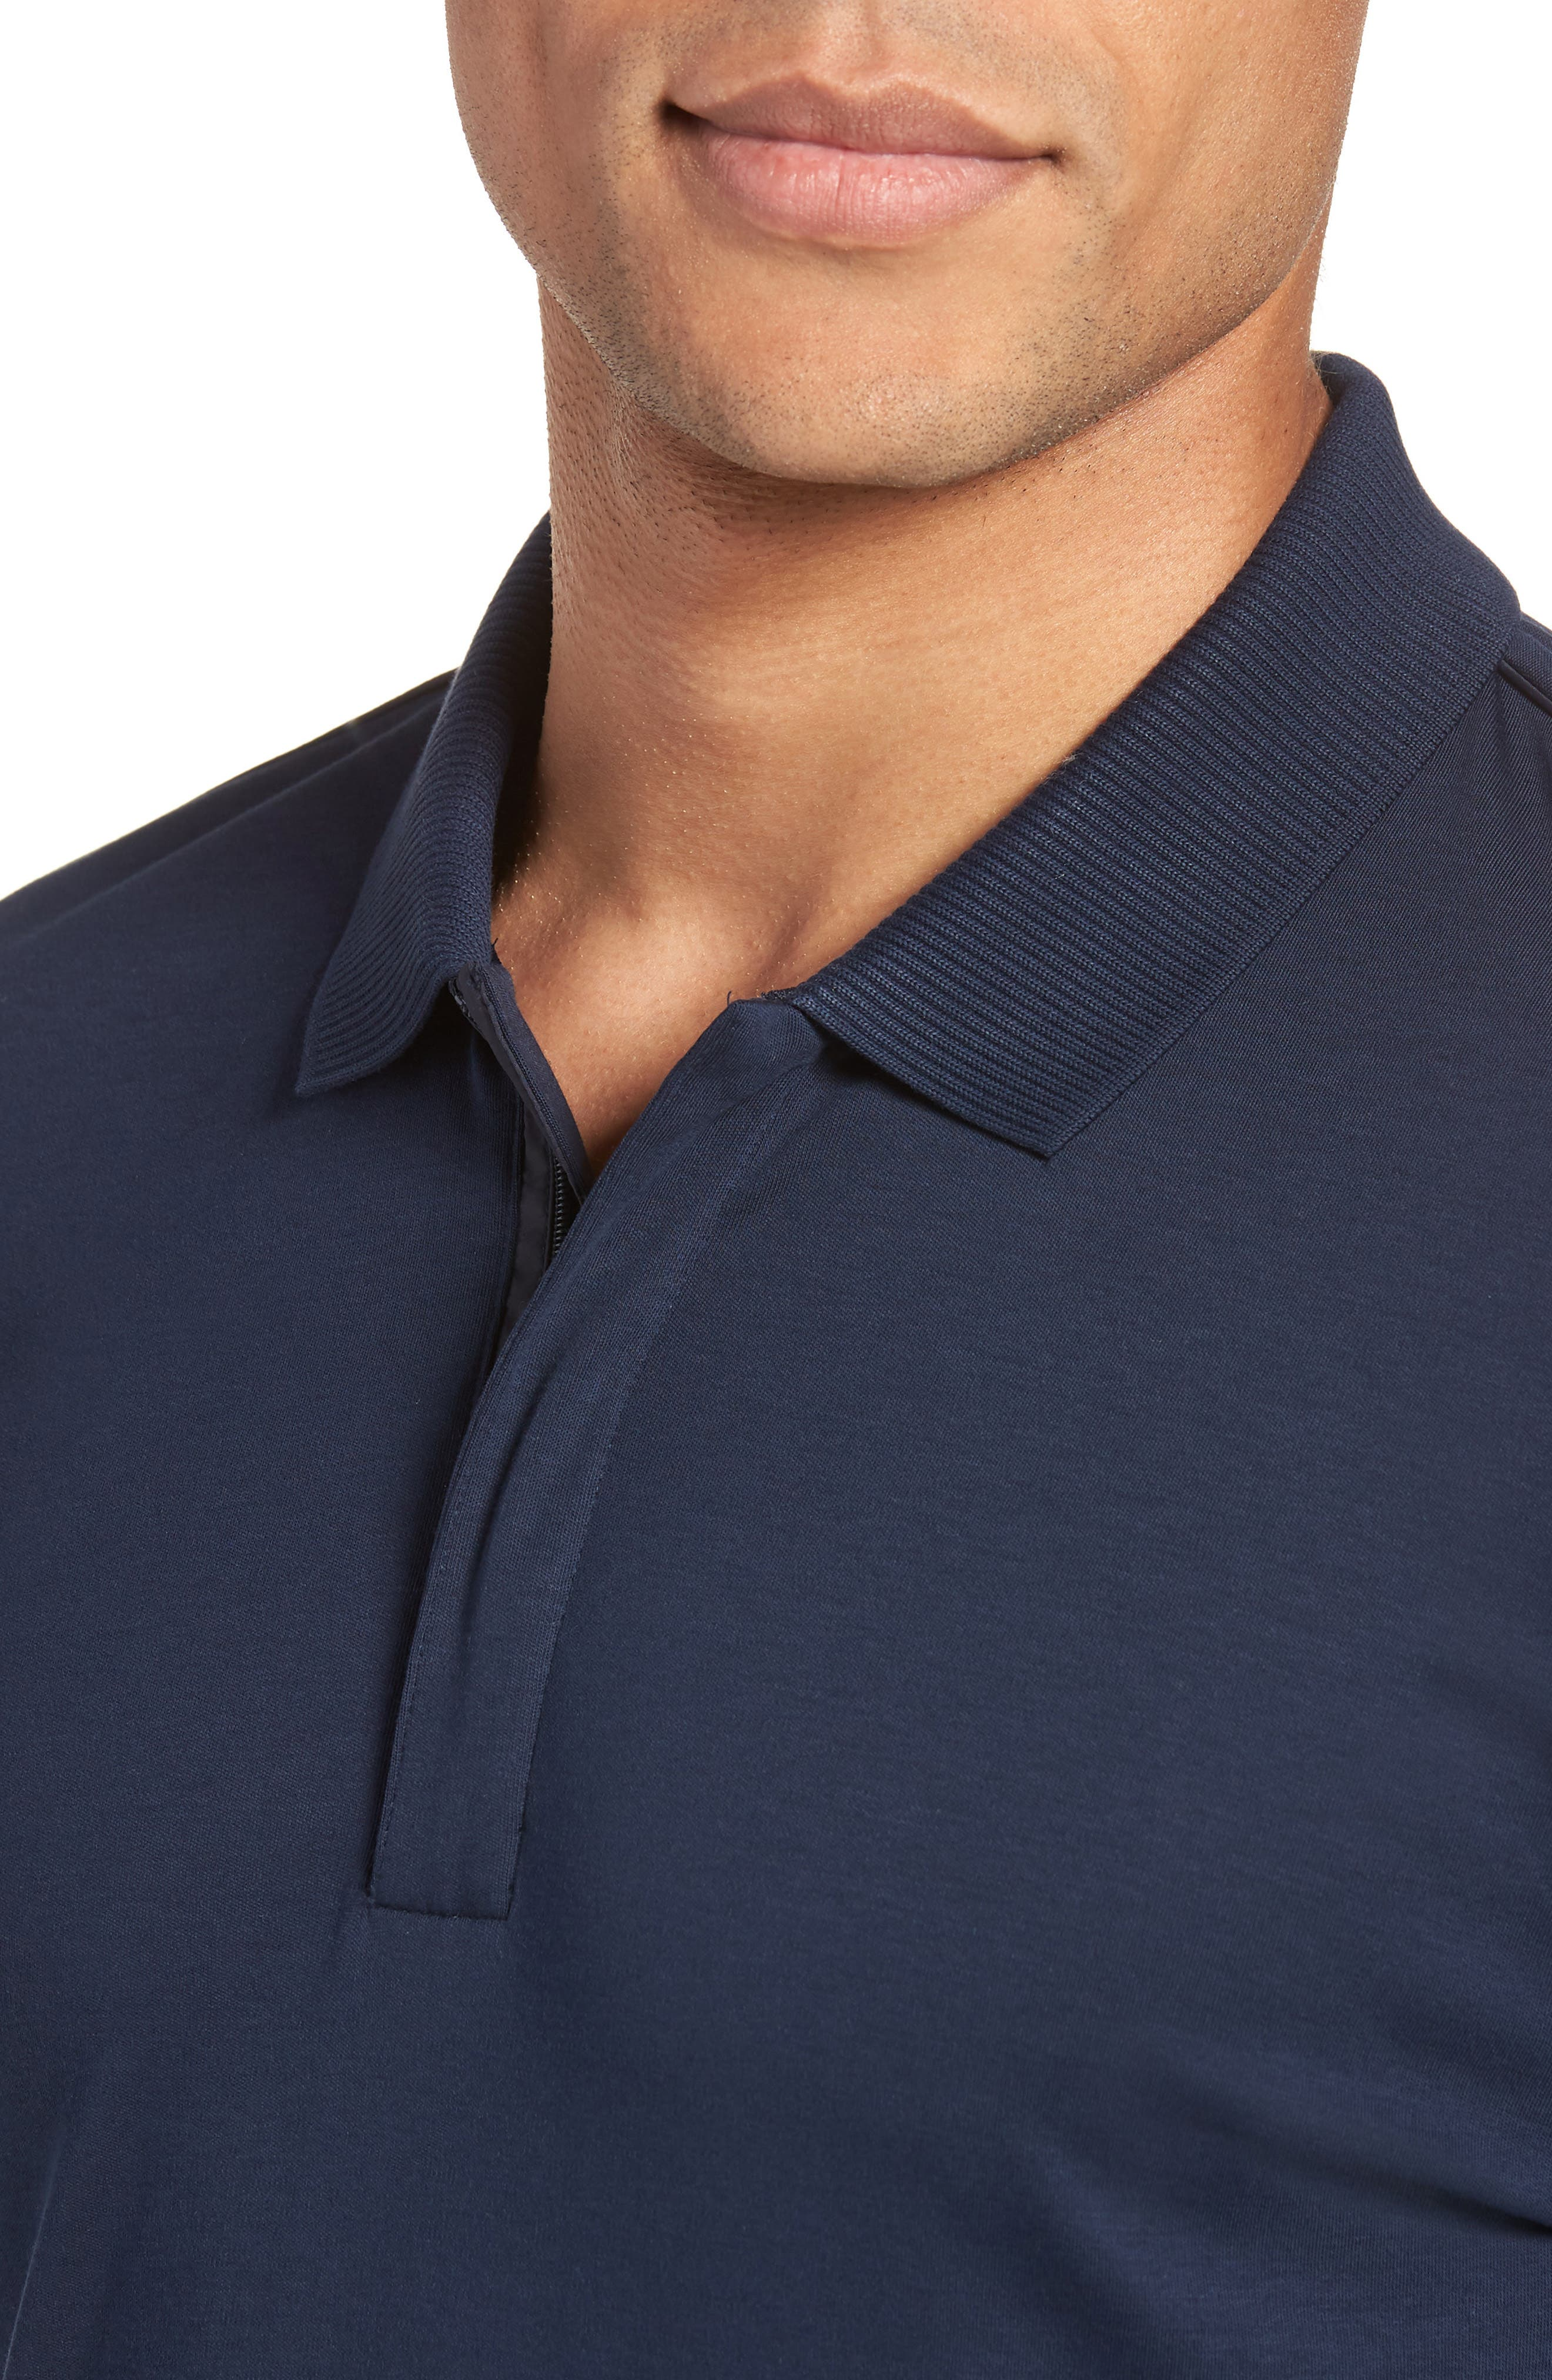 Pohl Polo Shirt,                             Alternate thumbnail 4, color,                             Blue